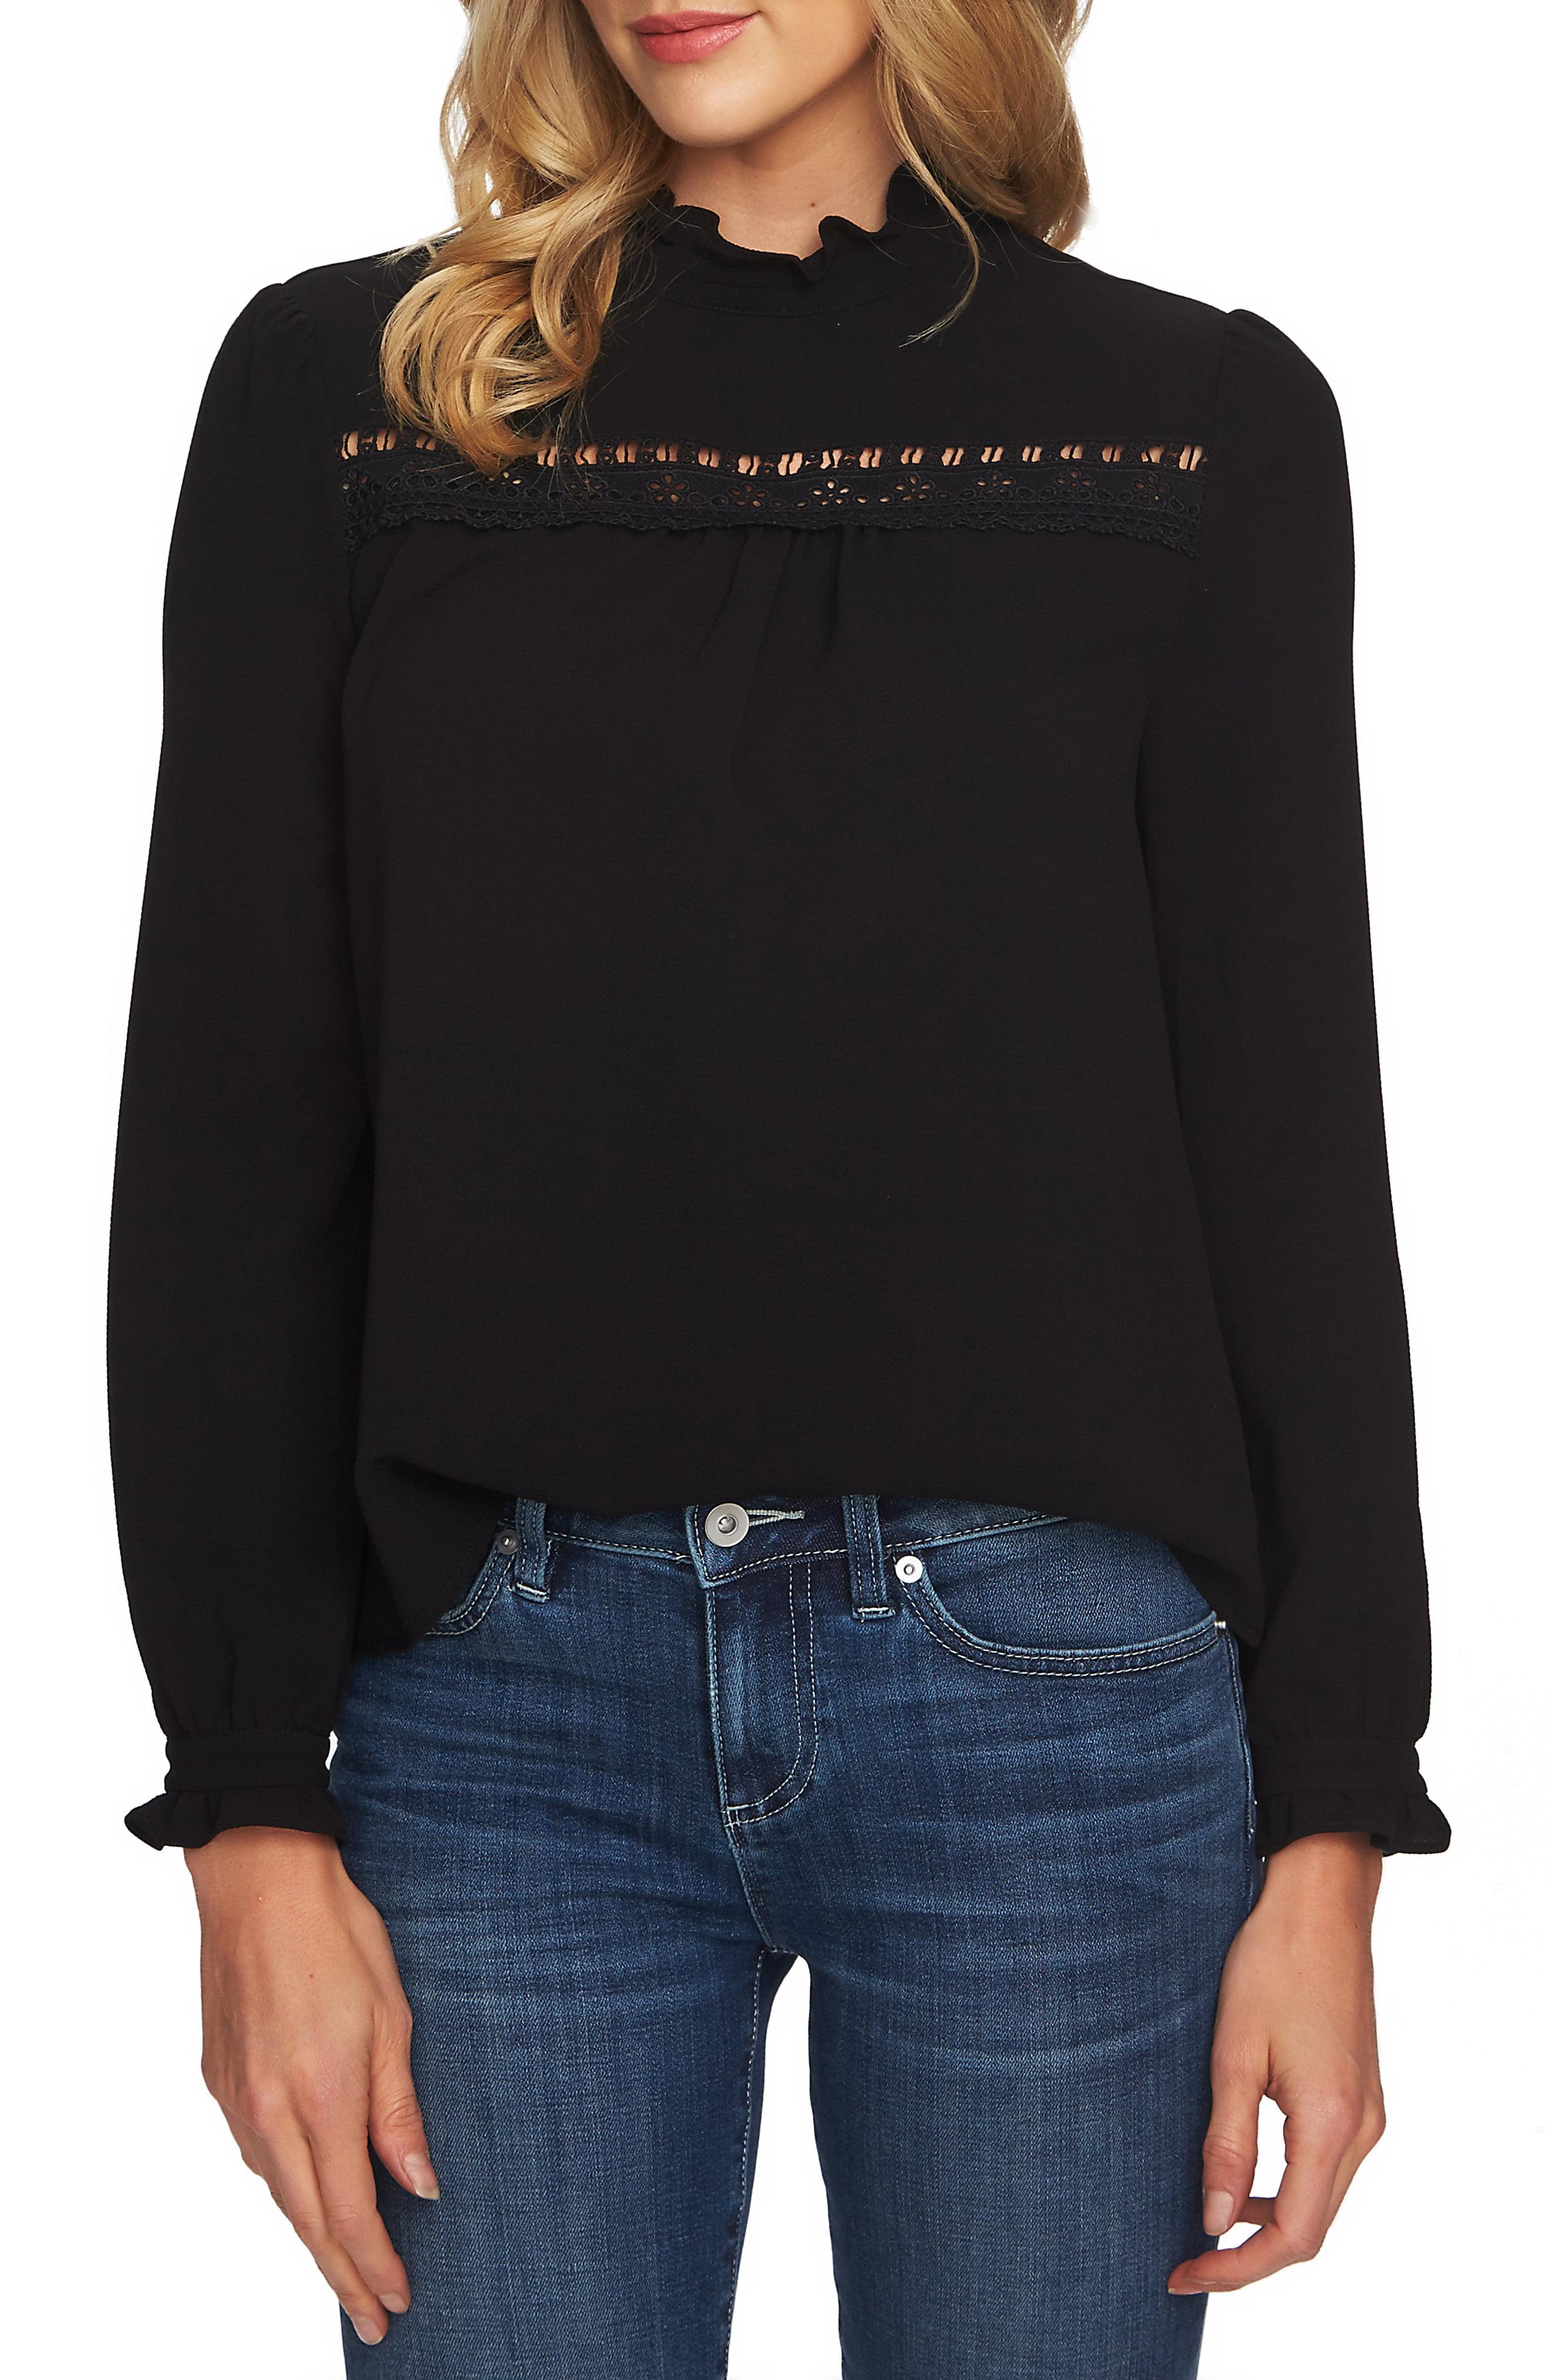 6482db01459d17 Women's Cece Ruffle Neck Lace Detail Blouse, Size X-Small - Black ...